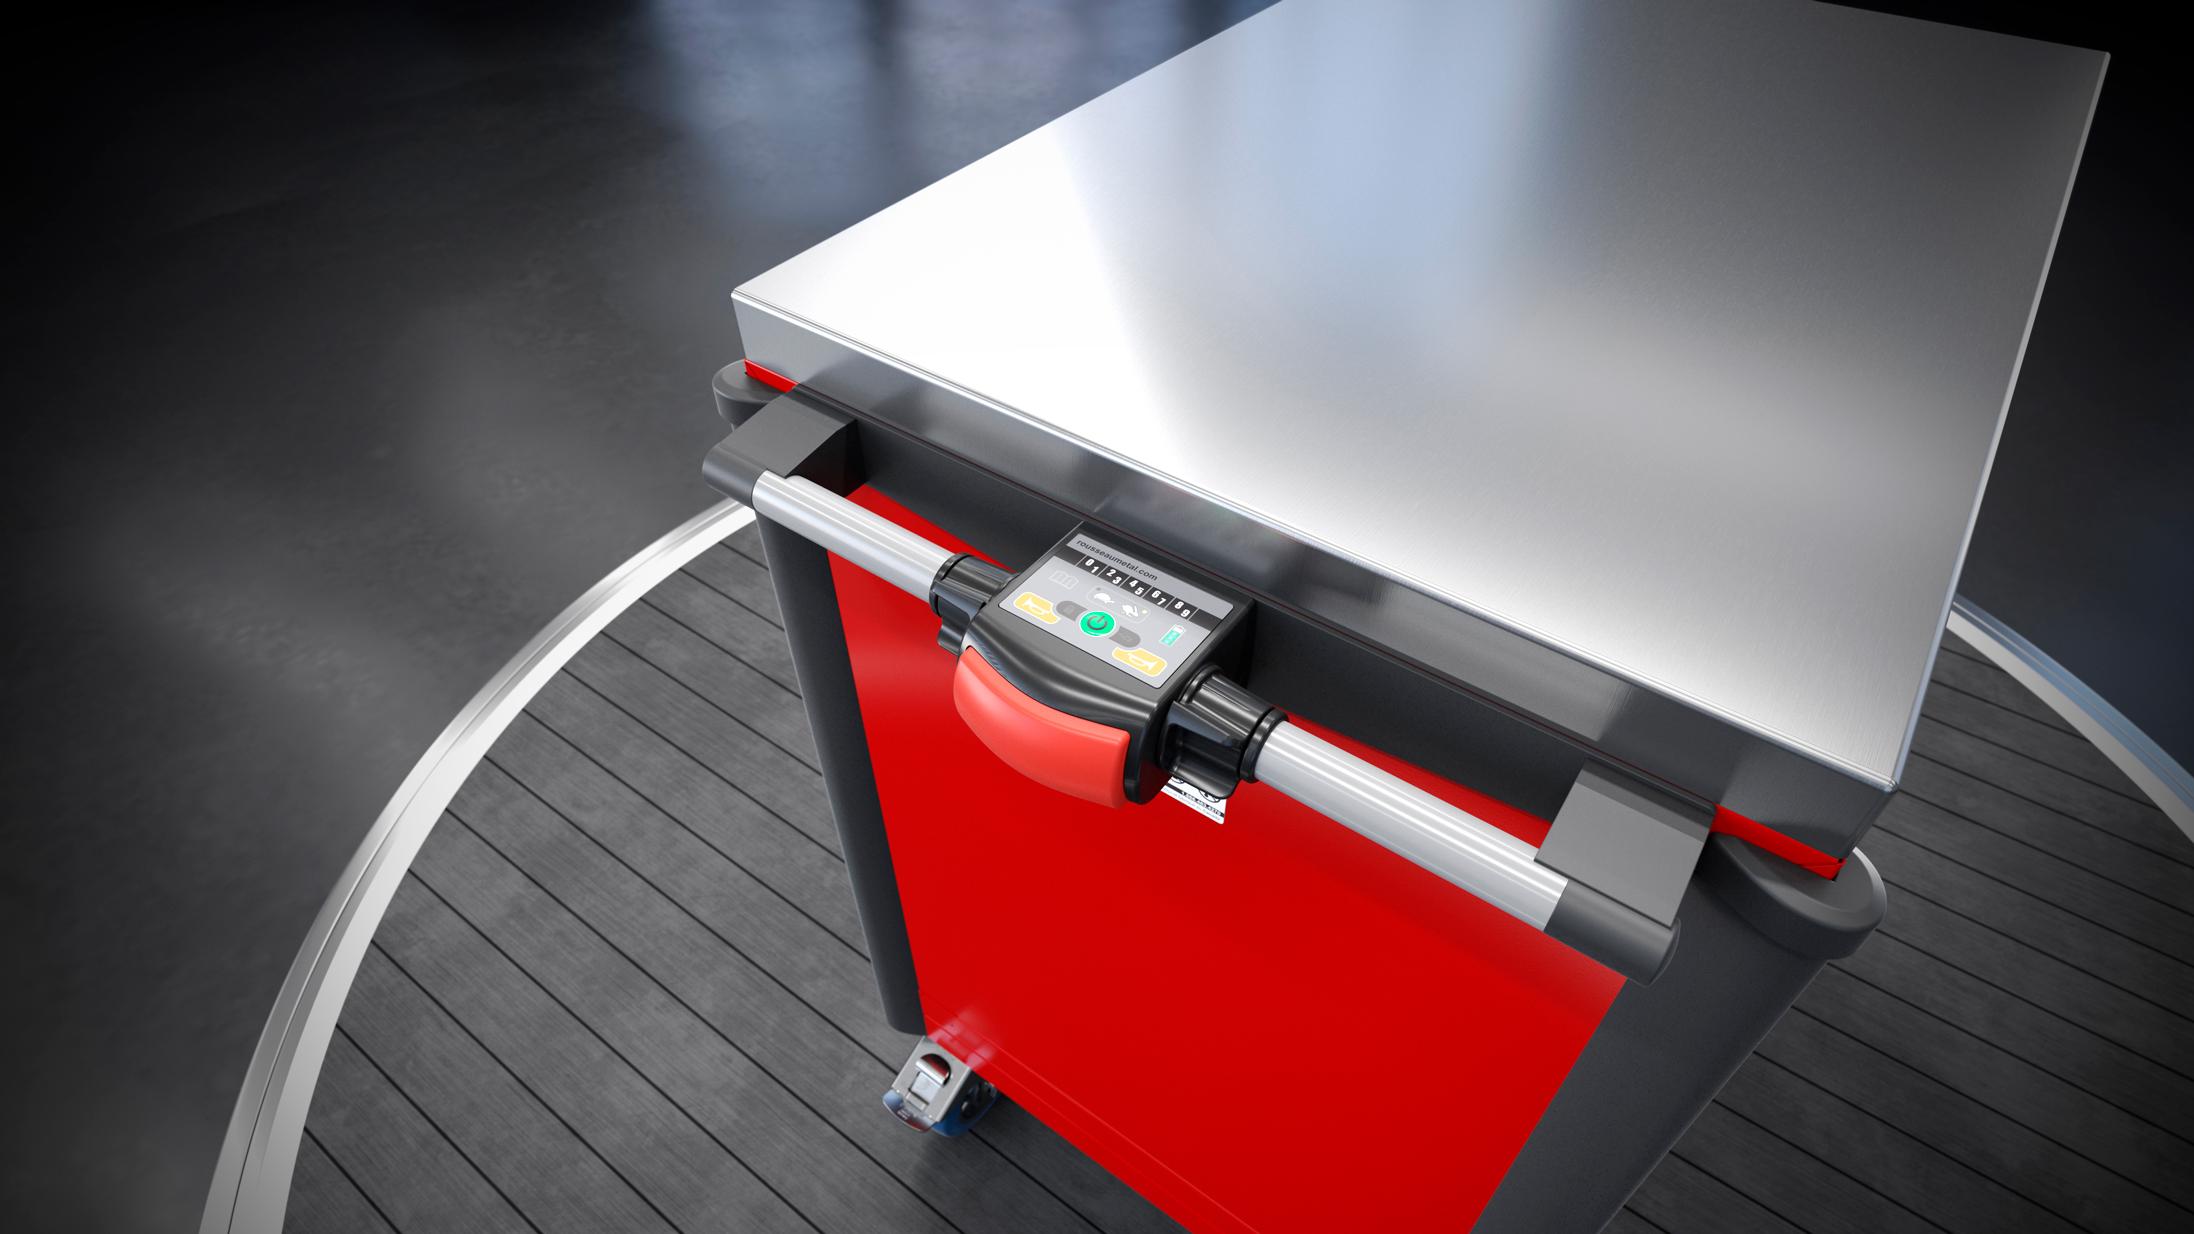 Motorized toolbox controls